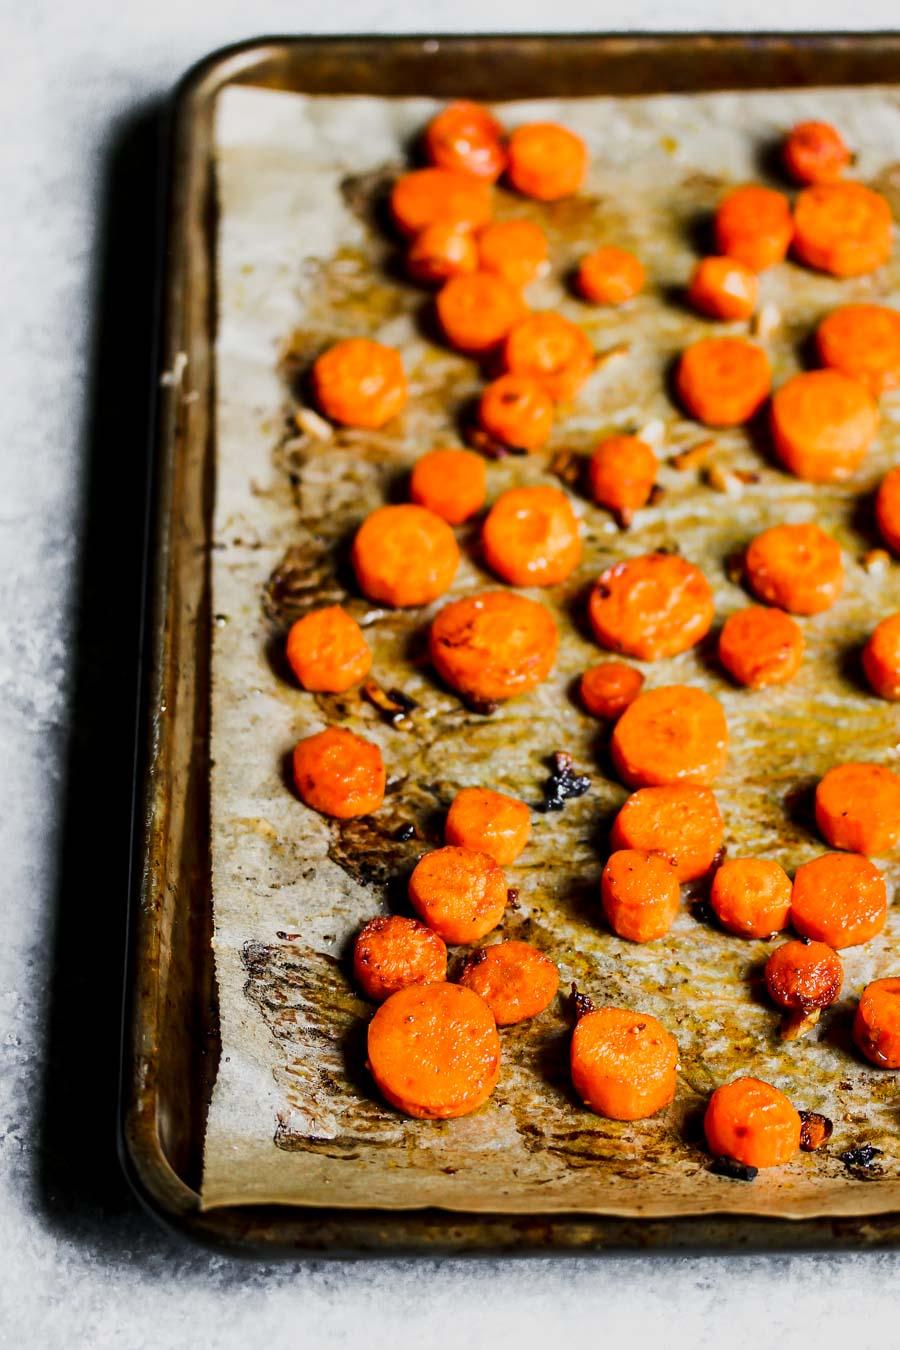 Balsamic-Roasted Carrots with Farro and Artichoke Gremolata